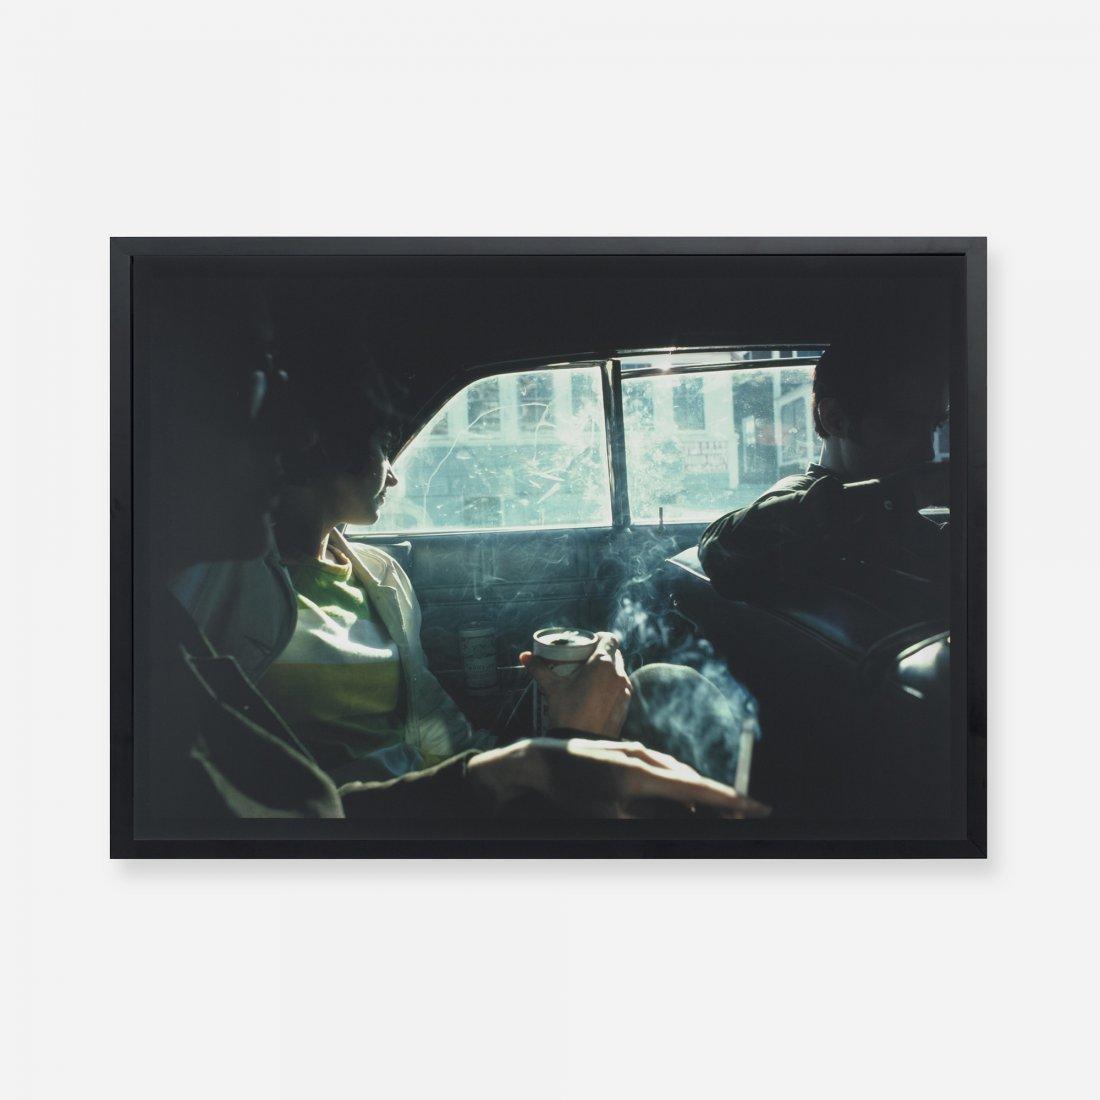 211: Nan Goldin Smoky car, New Hampshire